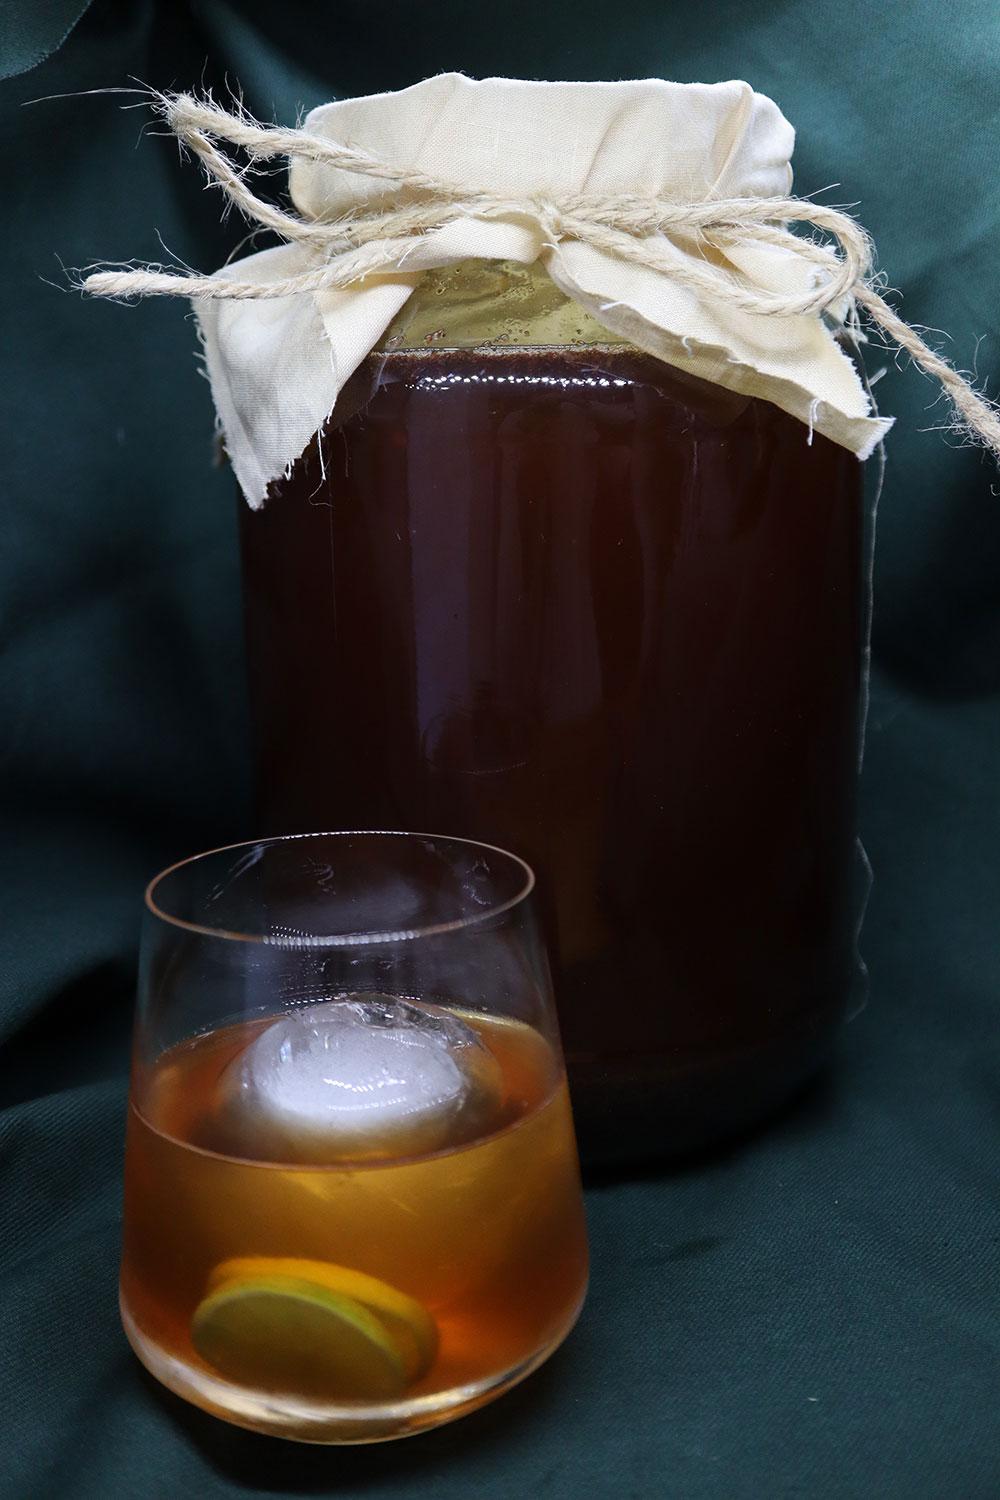 Kombucha honeybush home brew in a glass jar.